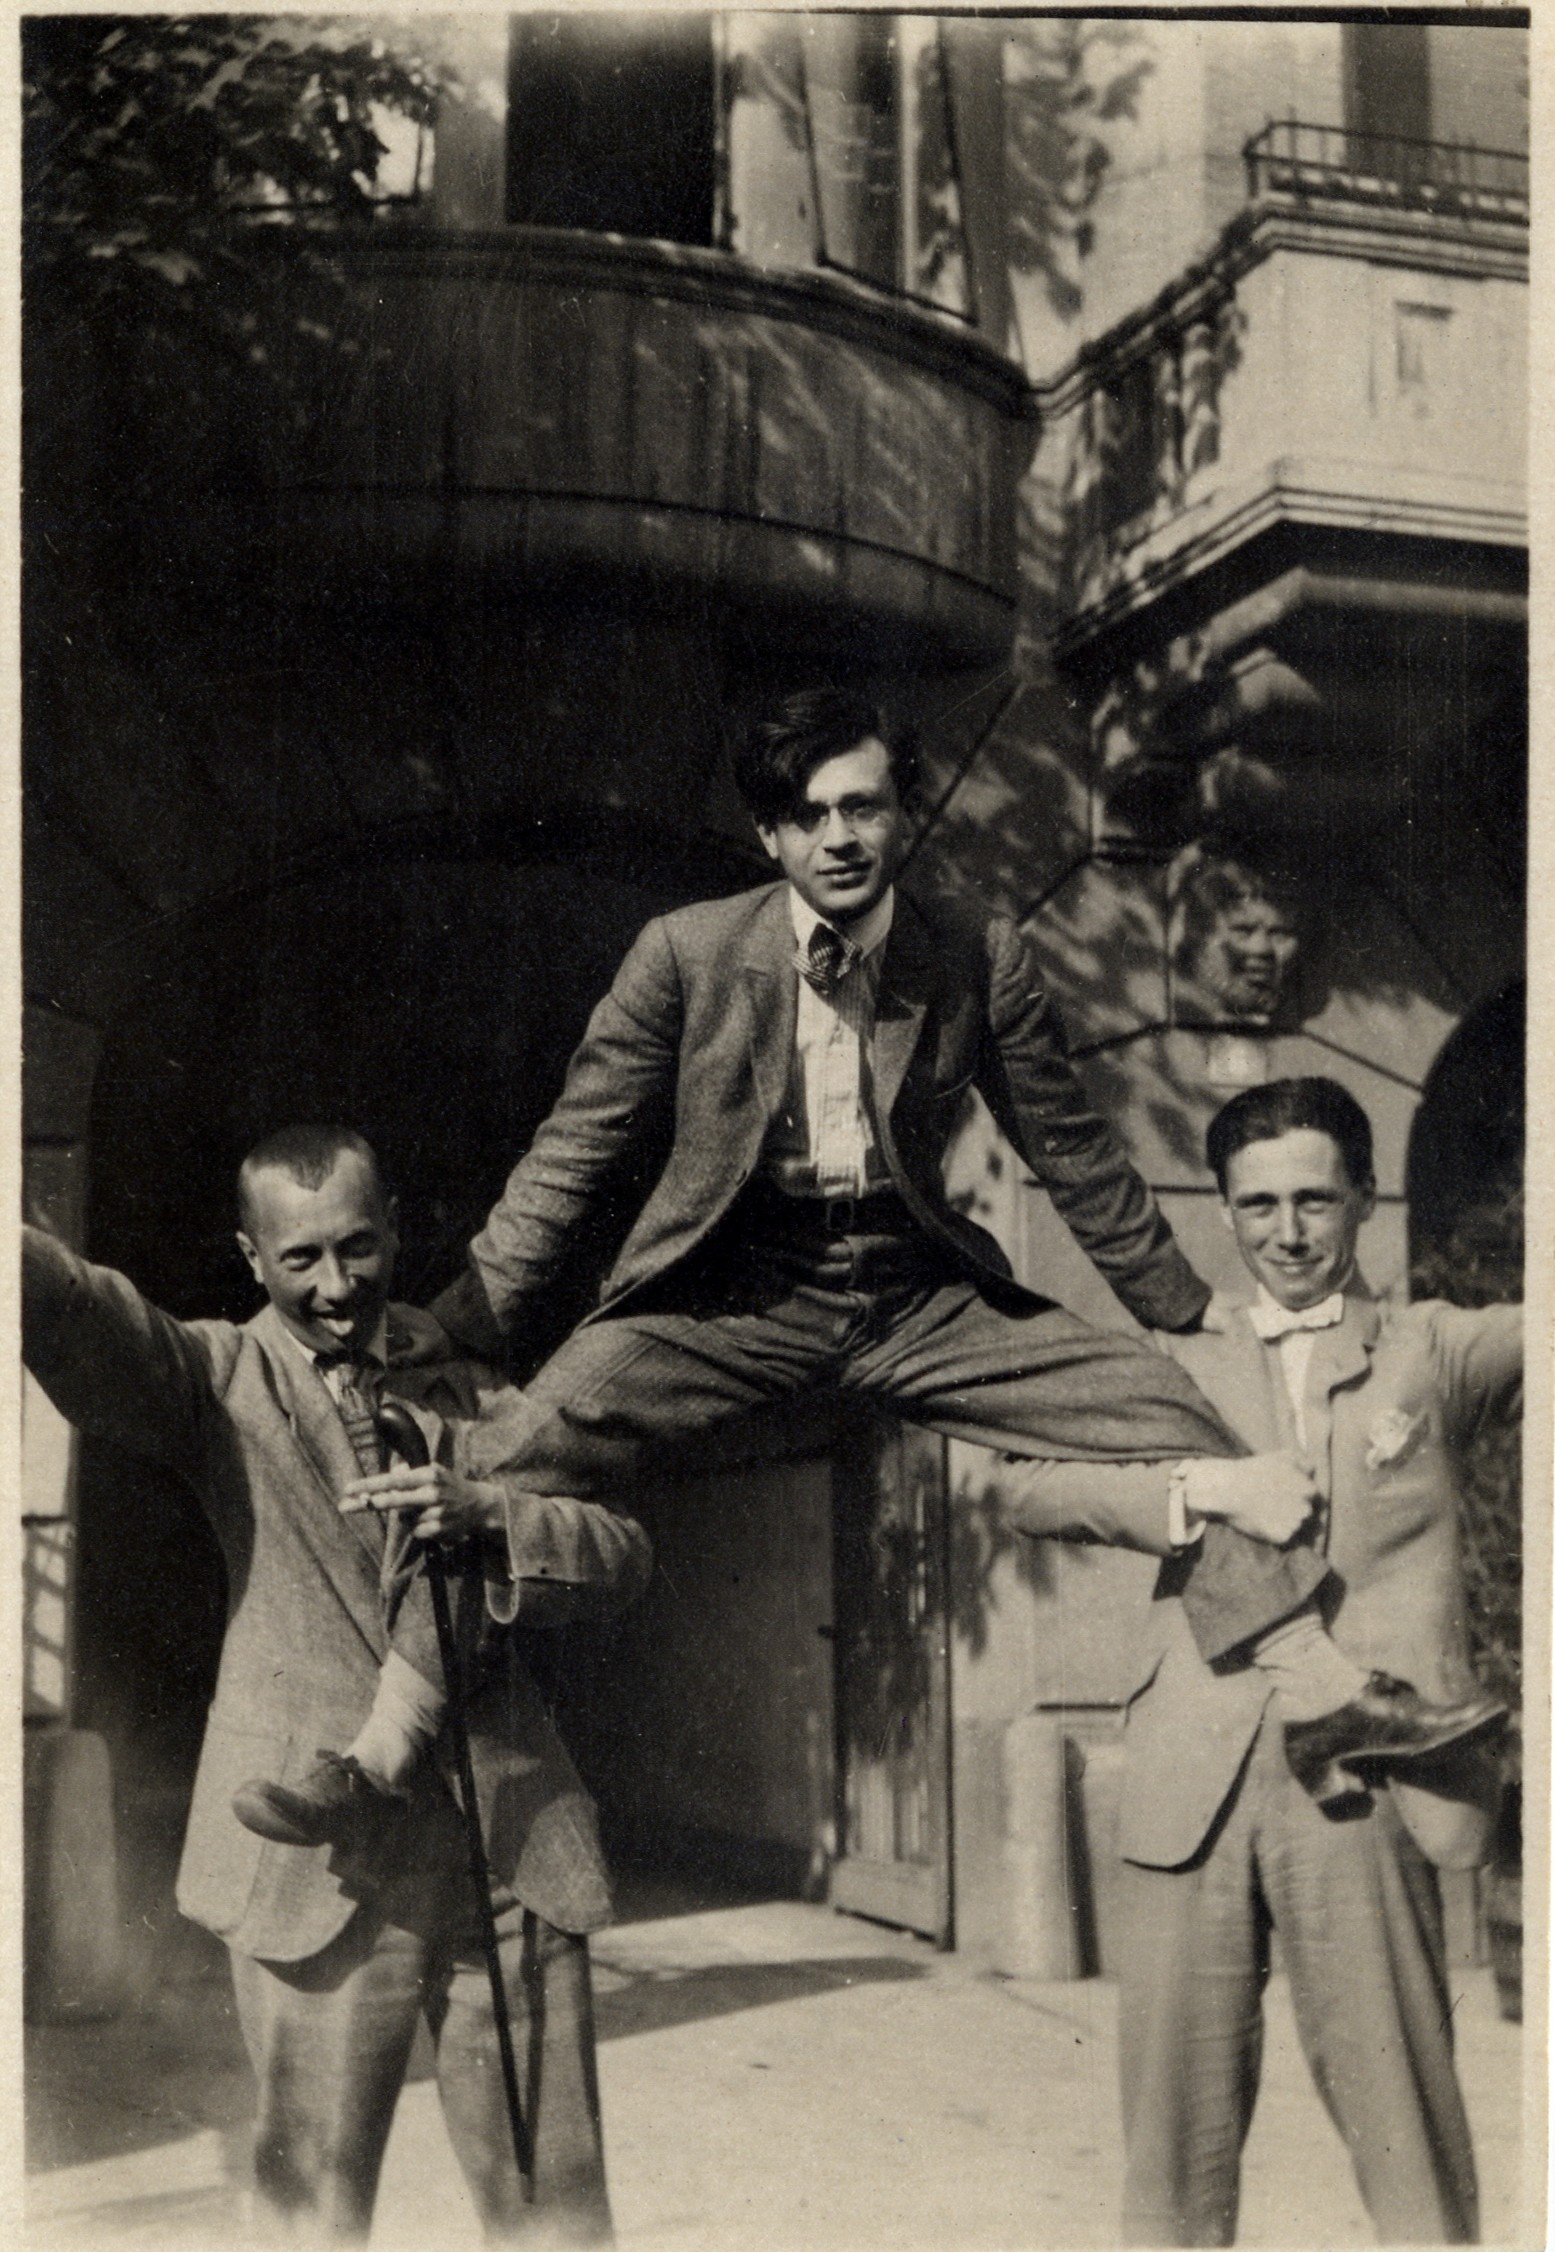 Hans Arp, Tristan Tzara and Hans Richter in front of the Hotel Elite, Zurich 1918